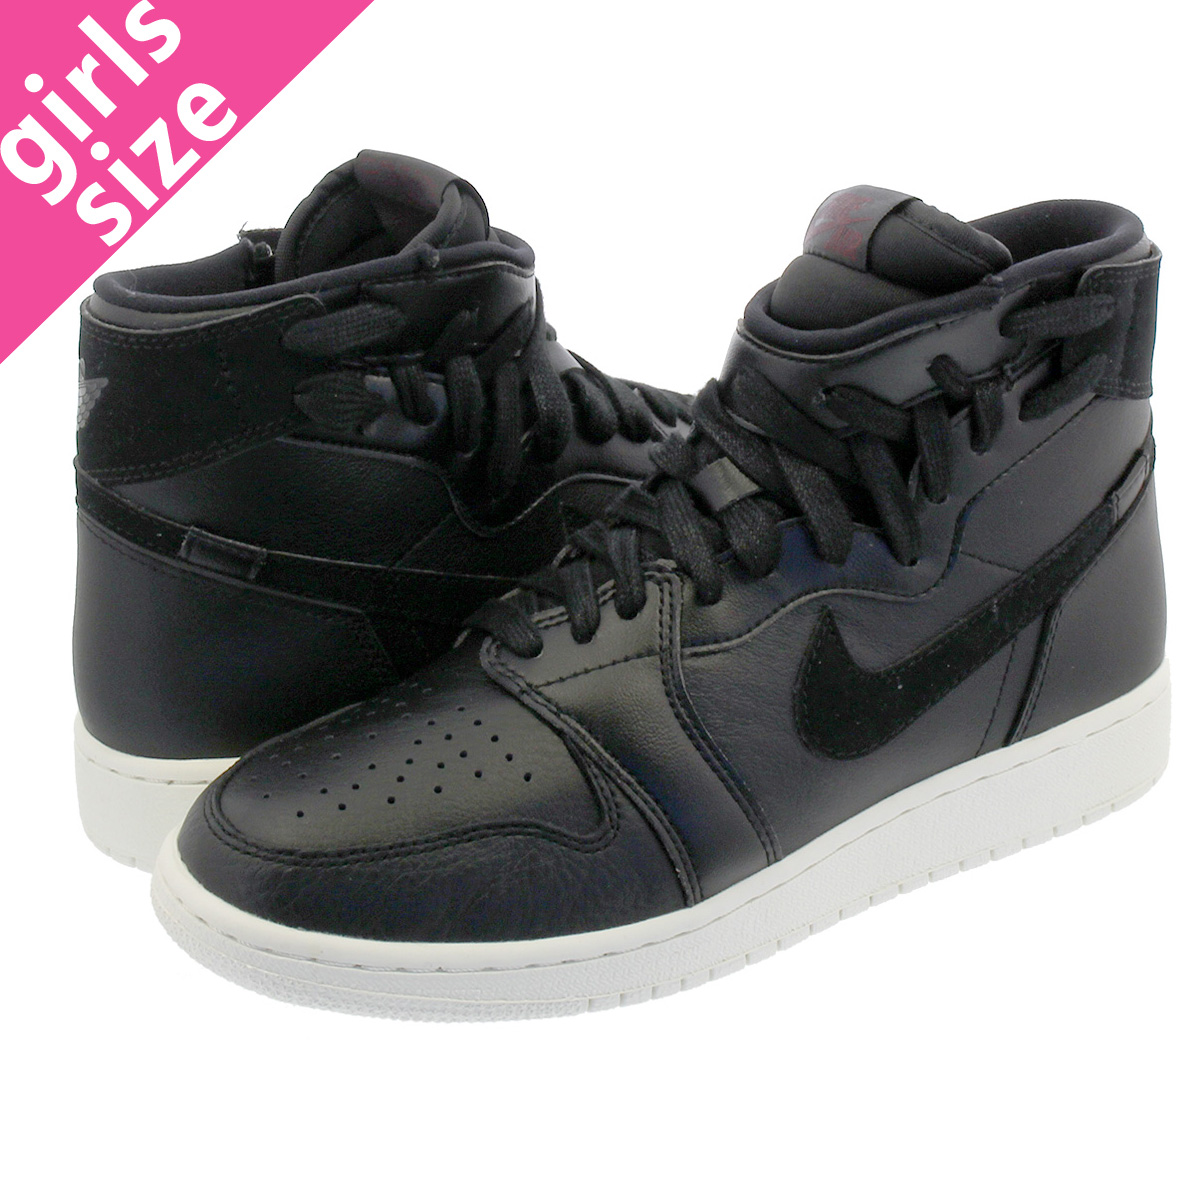 7c5a72de594 NIKE WMNS AIR JORDAN 1 REBEL XX Nike women Air Jordan 1 level XX BLACK BLACK  SAIL BARELY ROSE ar5599-006